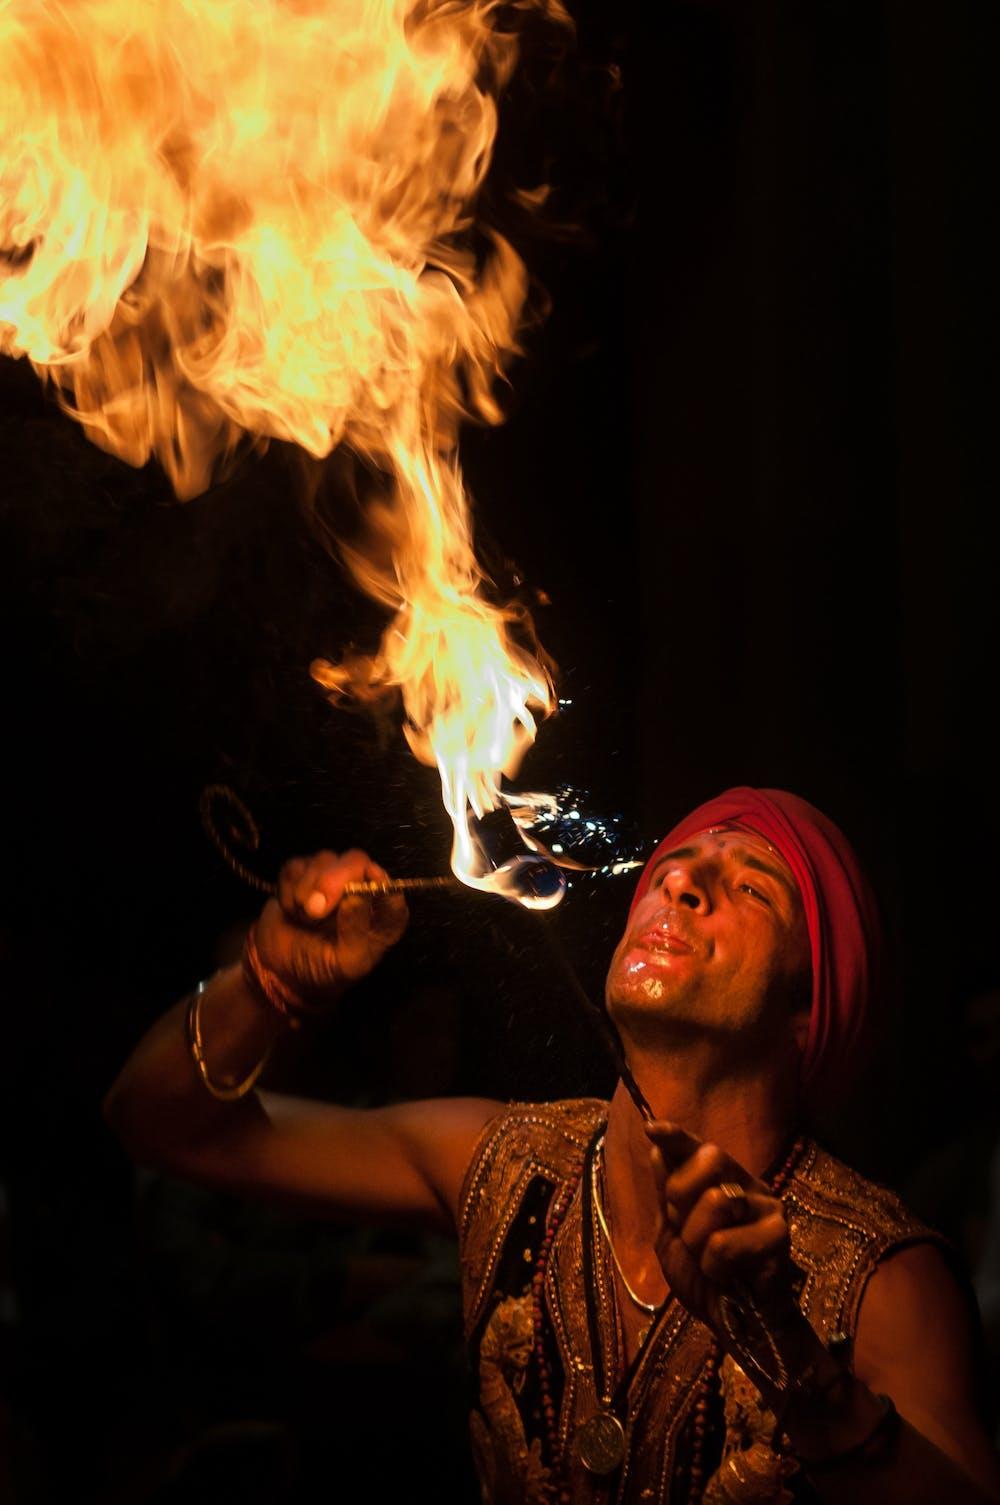 A man doing fire breath. | Photo: Pexels